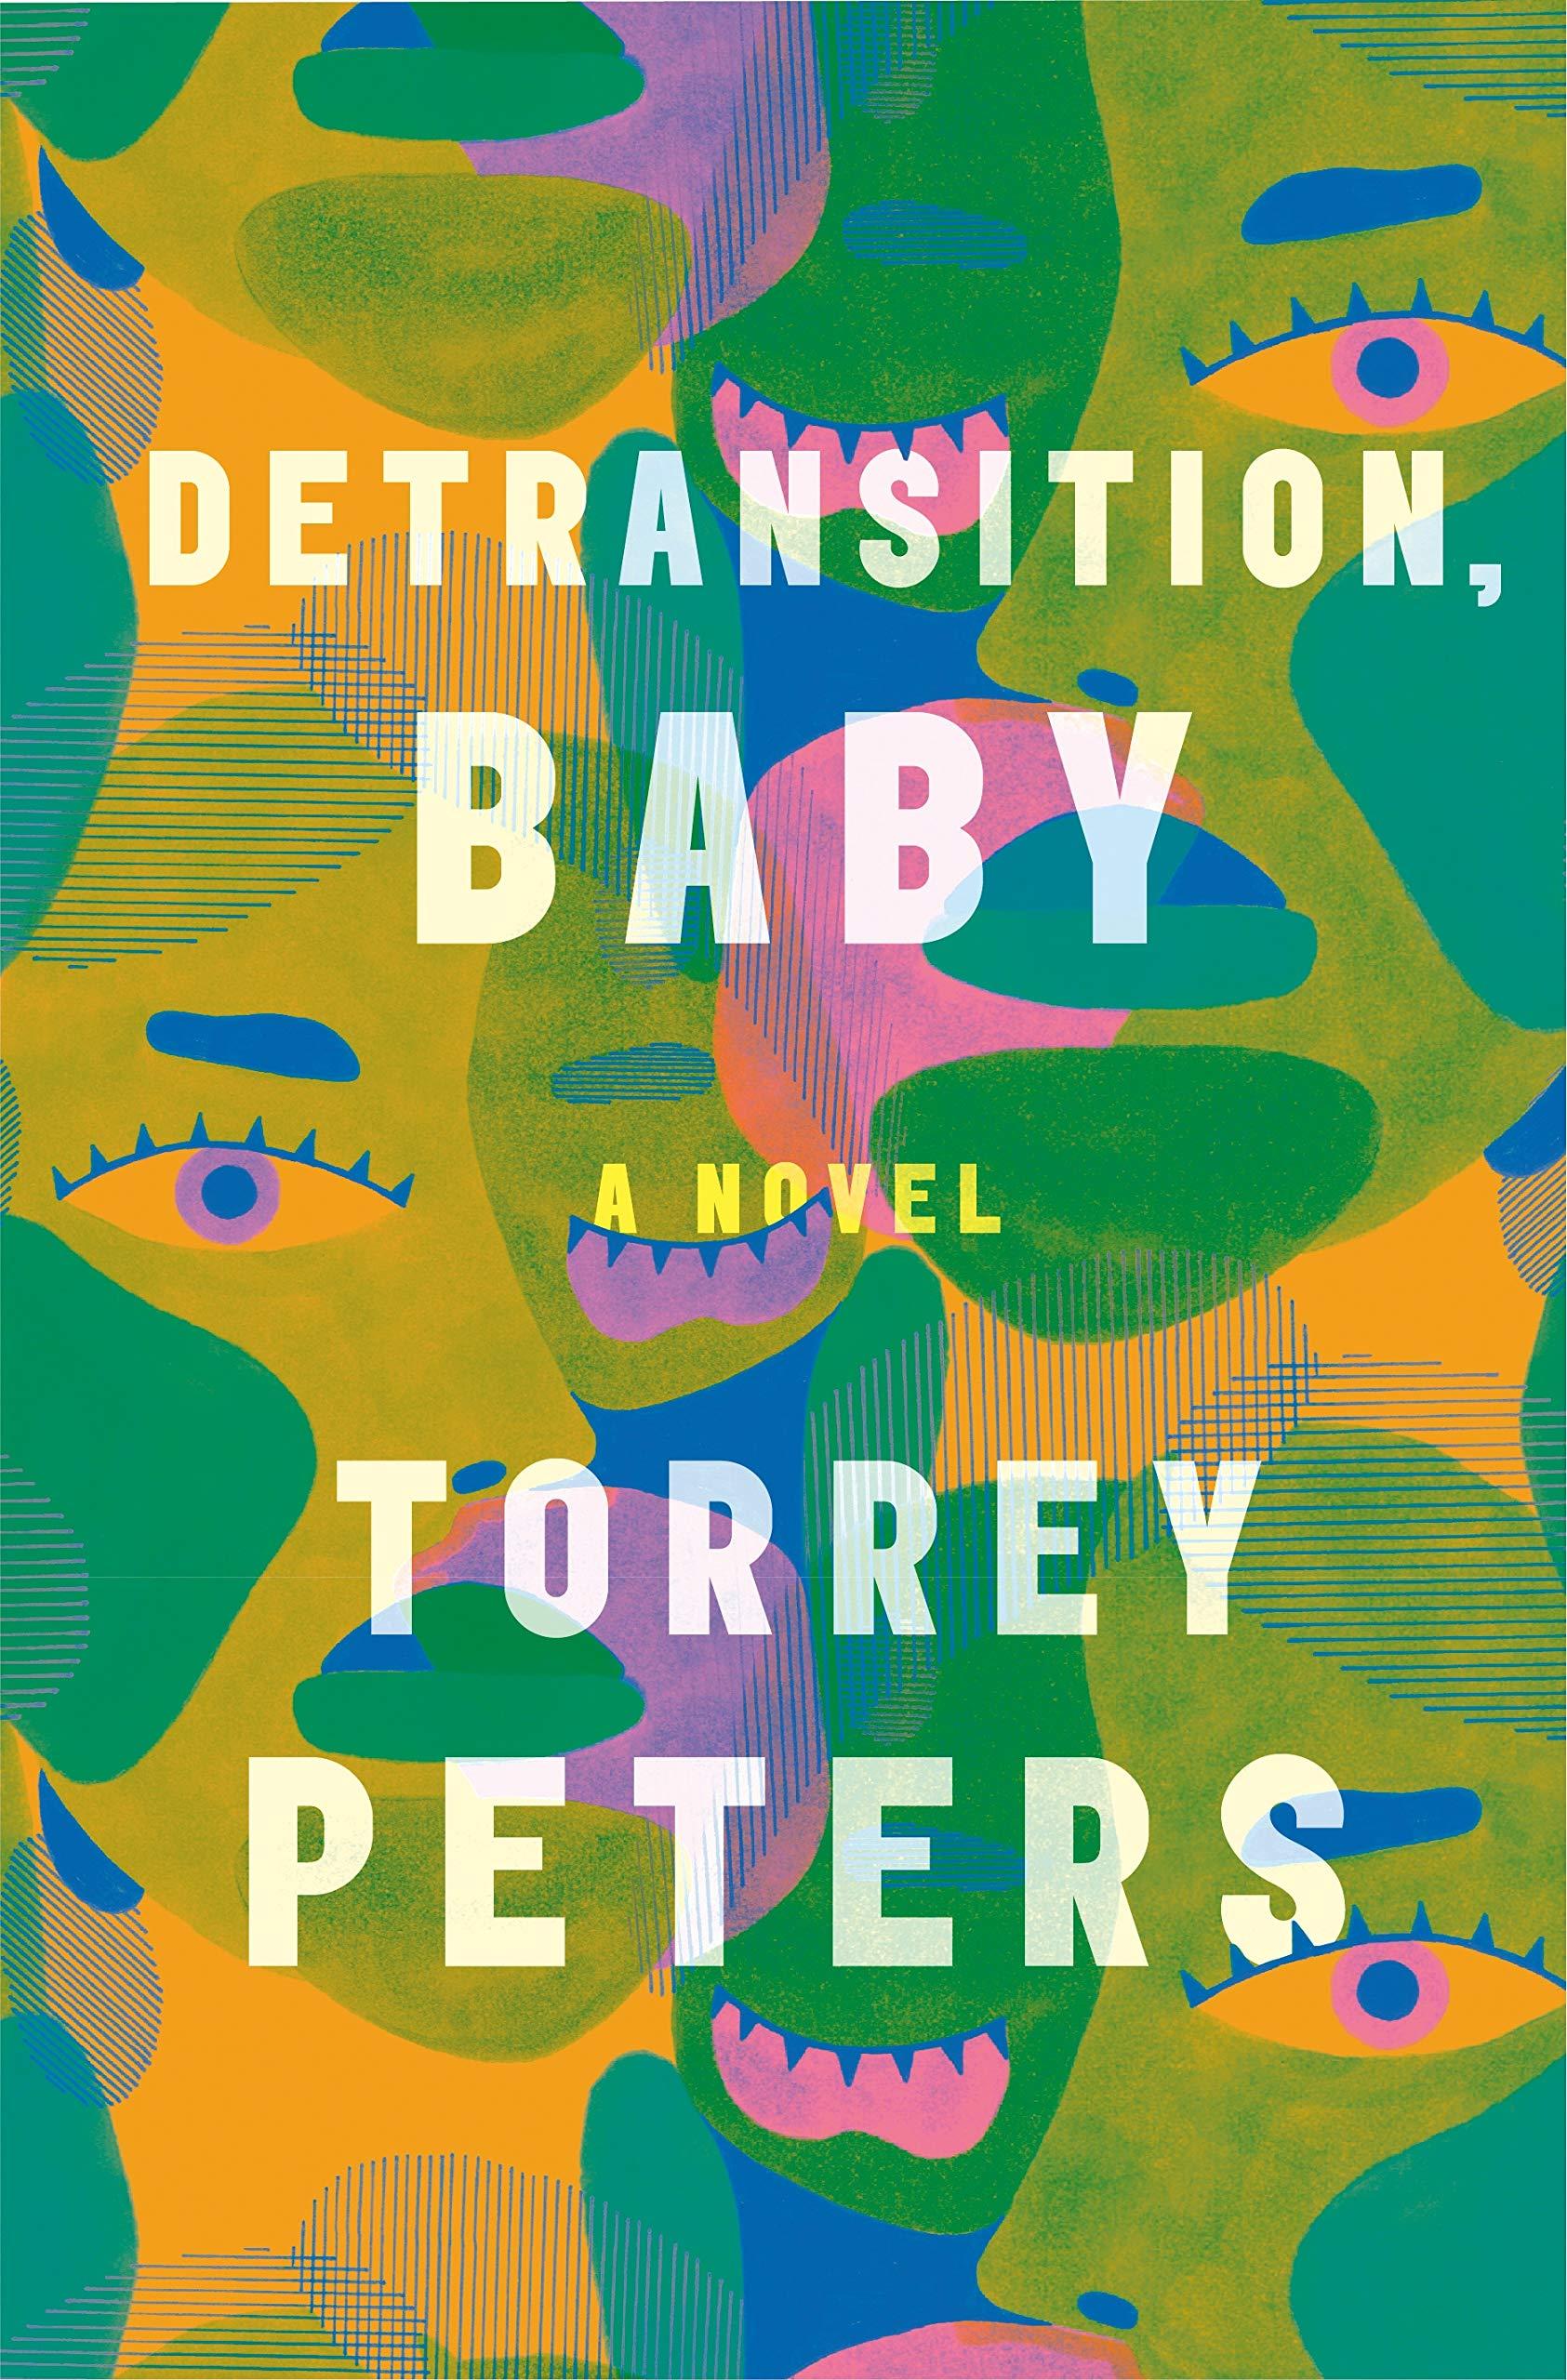 Amazon.com: Detransition, Baby: A Novel (9780593133378): Peters, Torrey:  Books